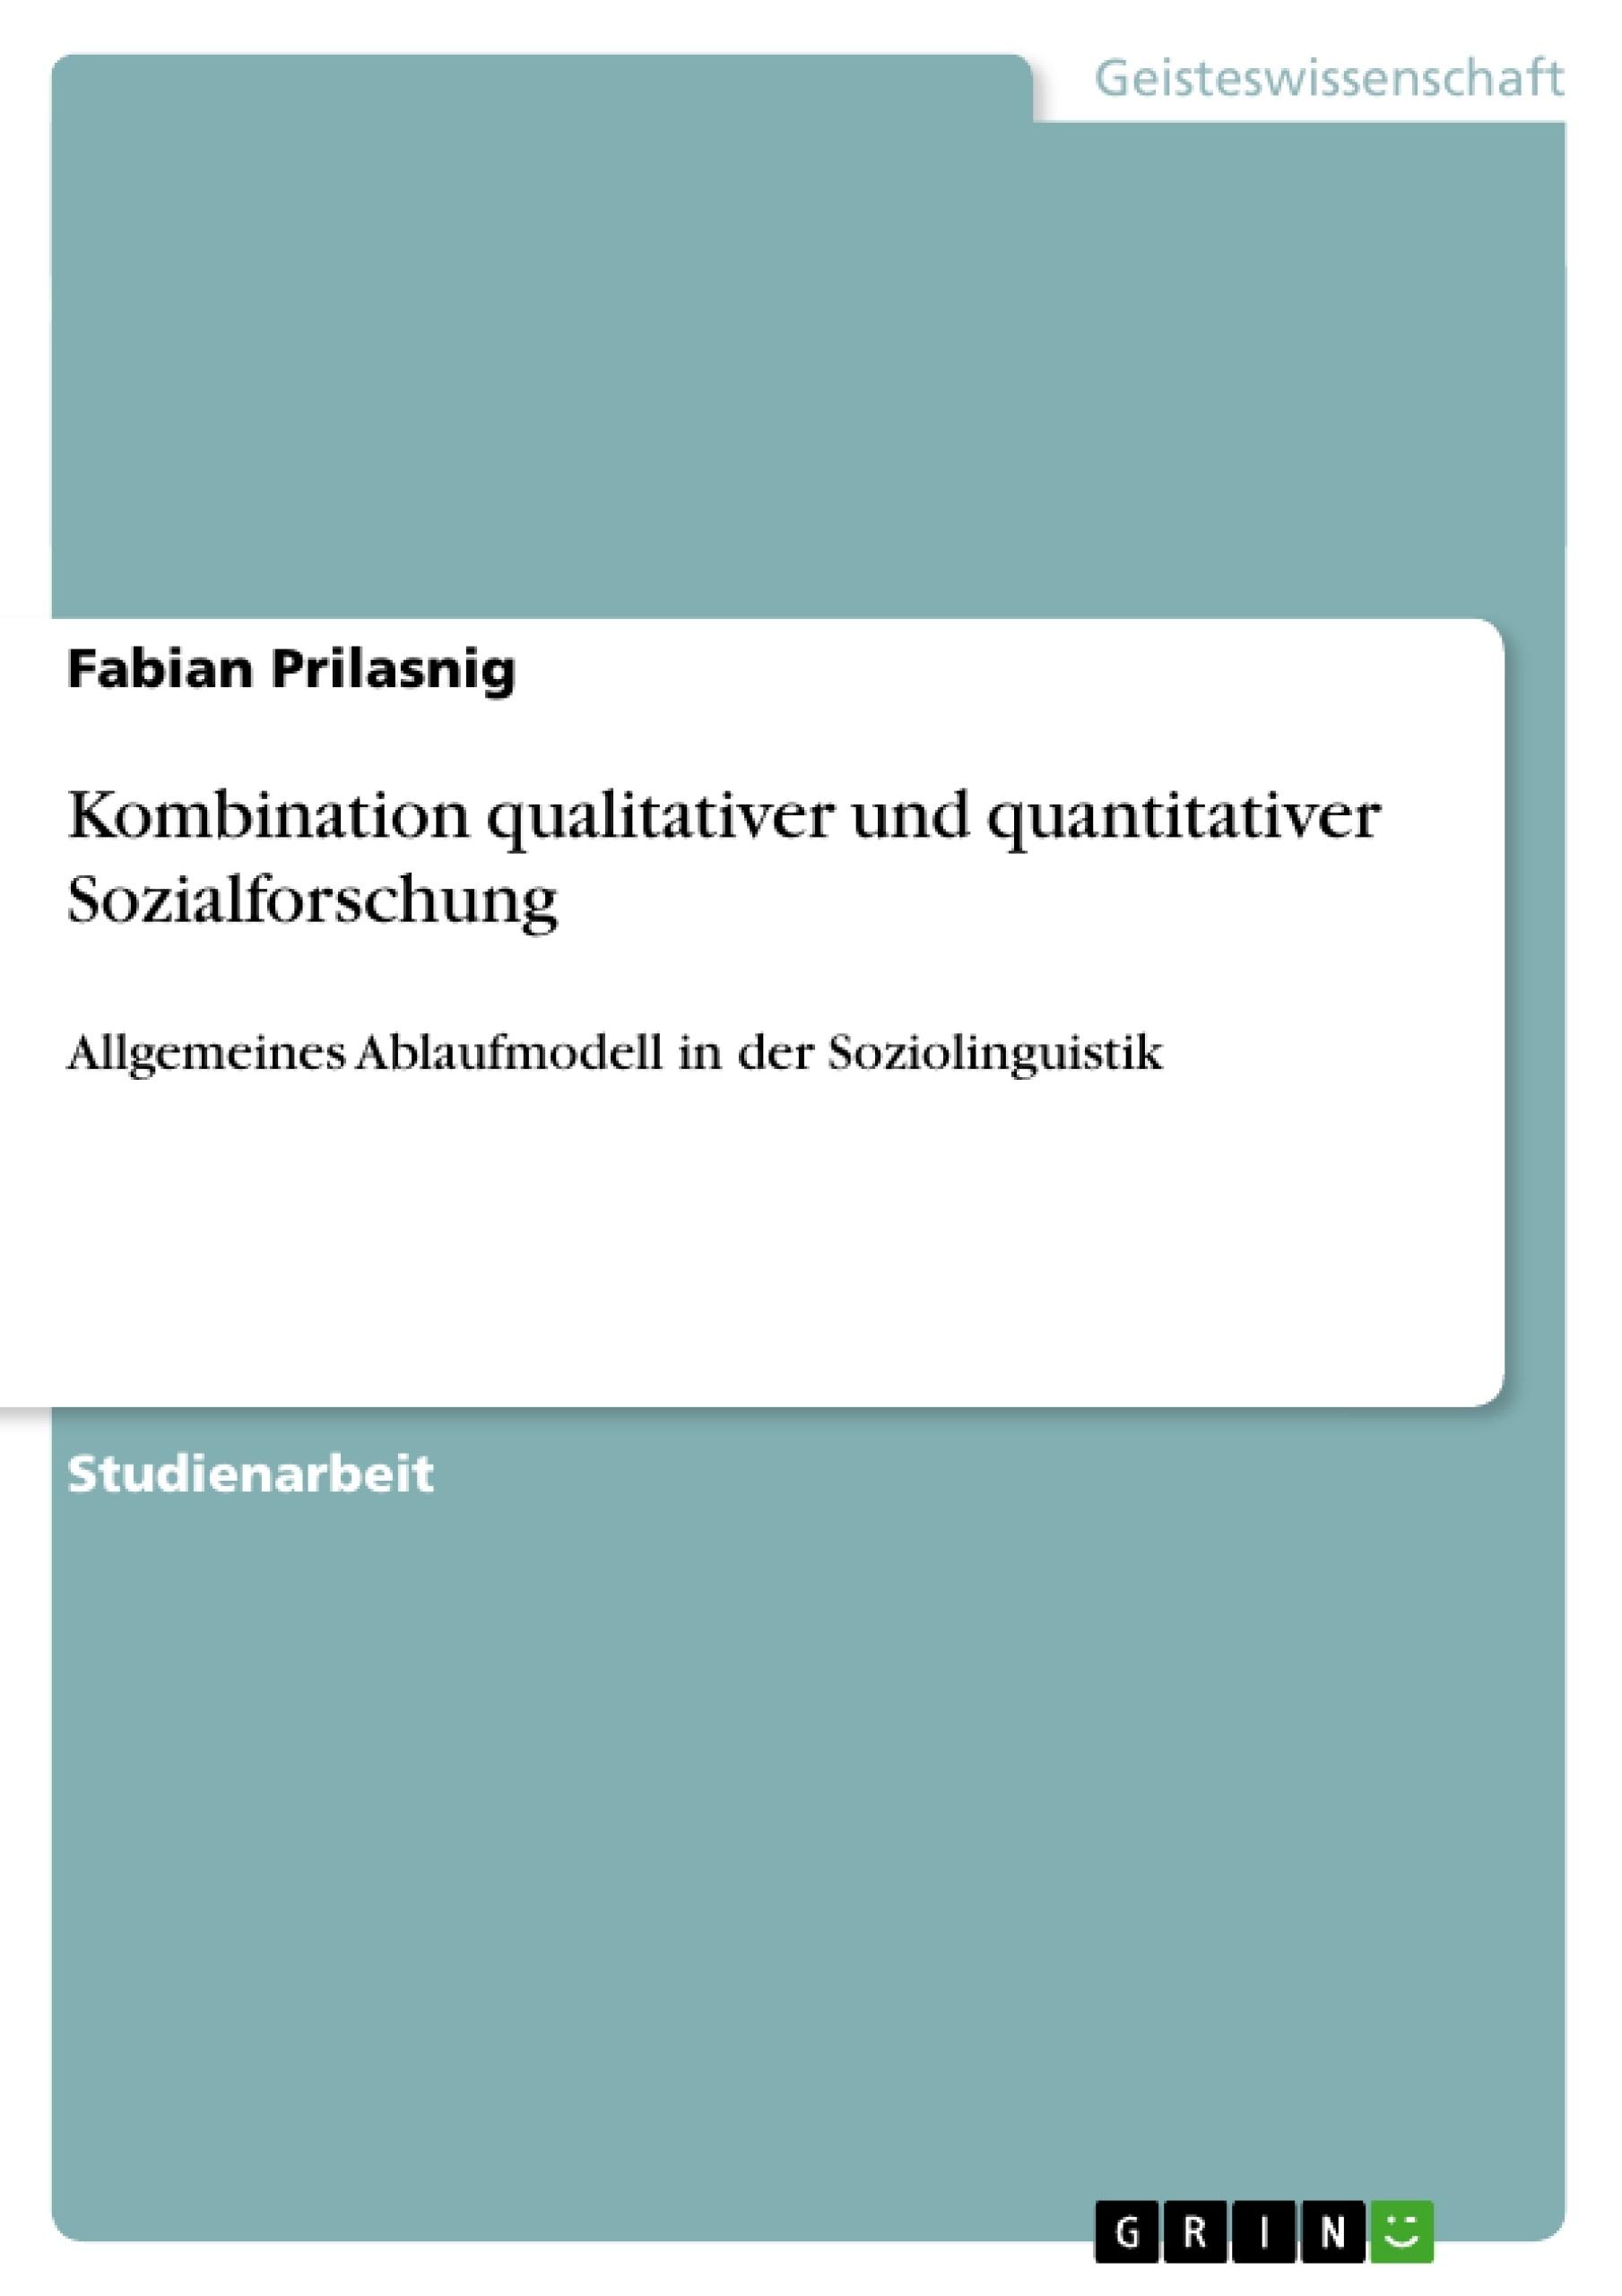 Titel: Kombination qualitativer und quantitativer Sozialforschung